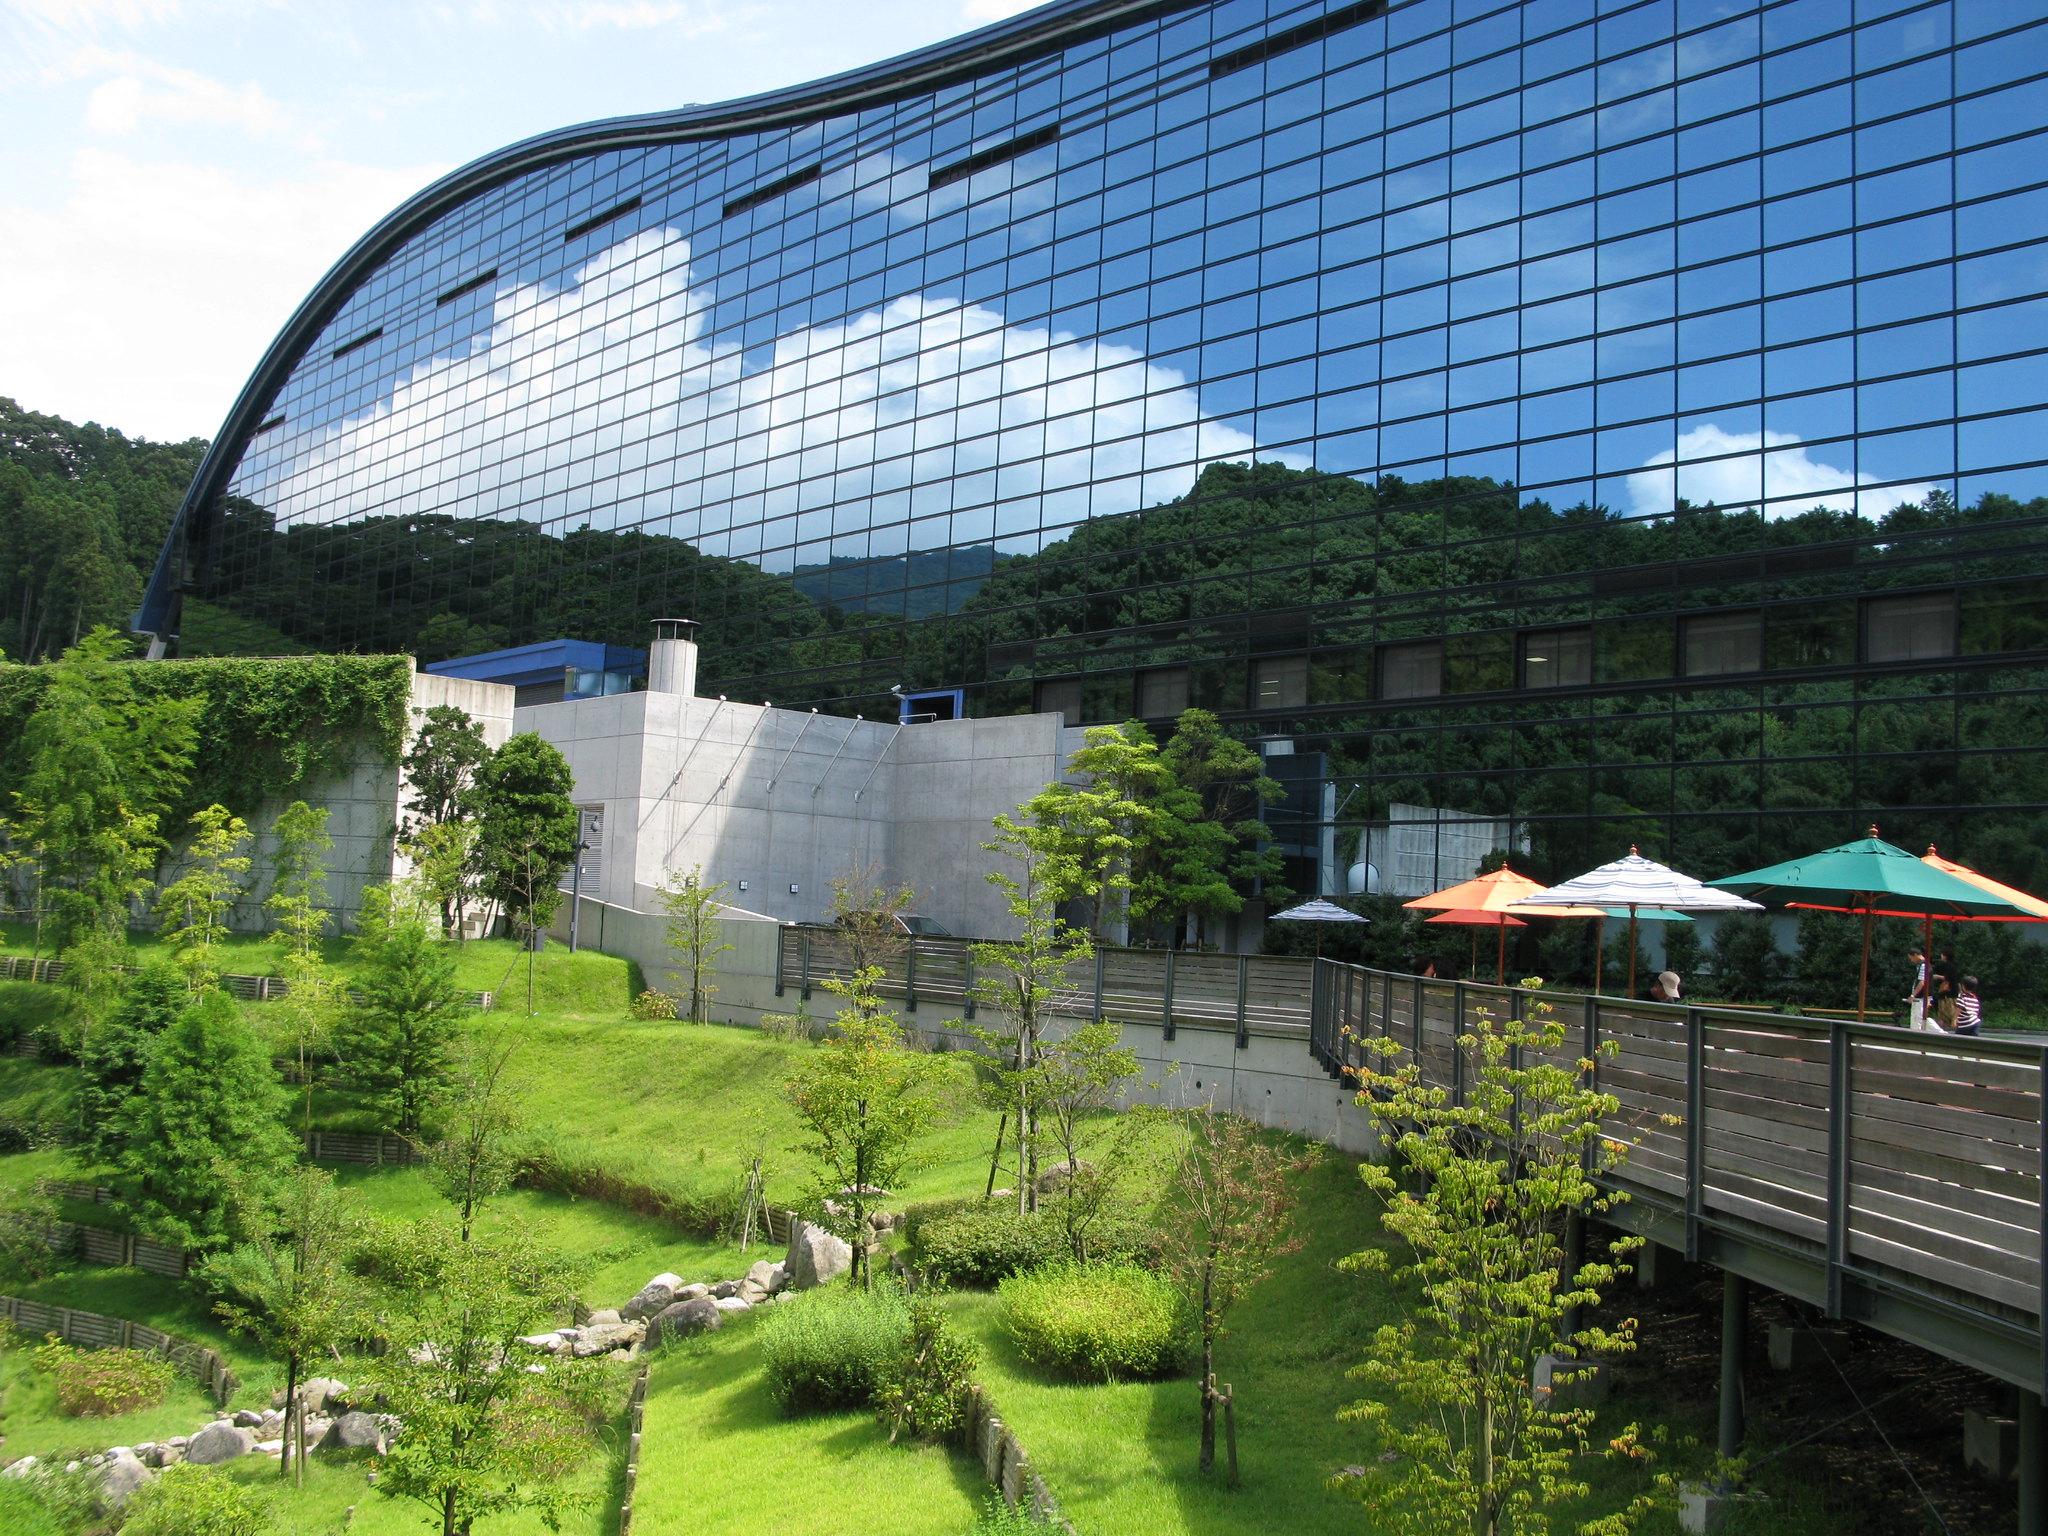 10 Things to do in Fukuoka, Japan 1